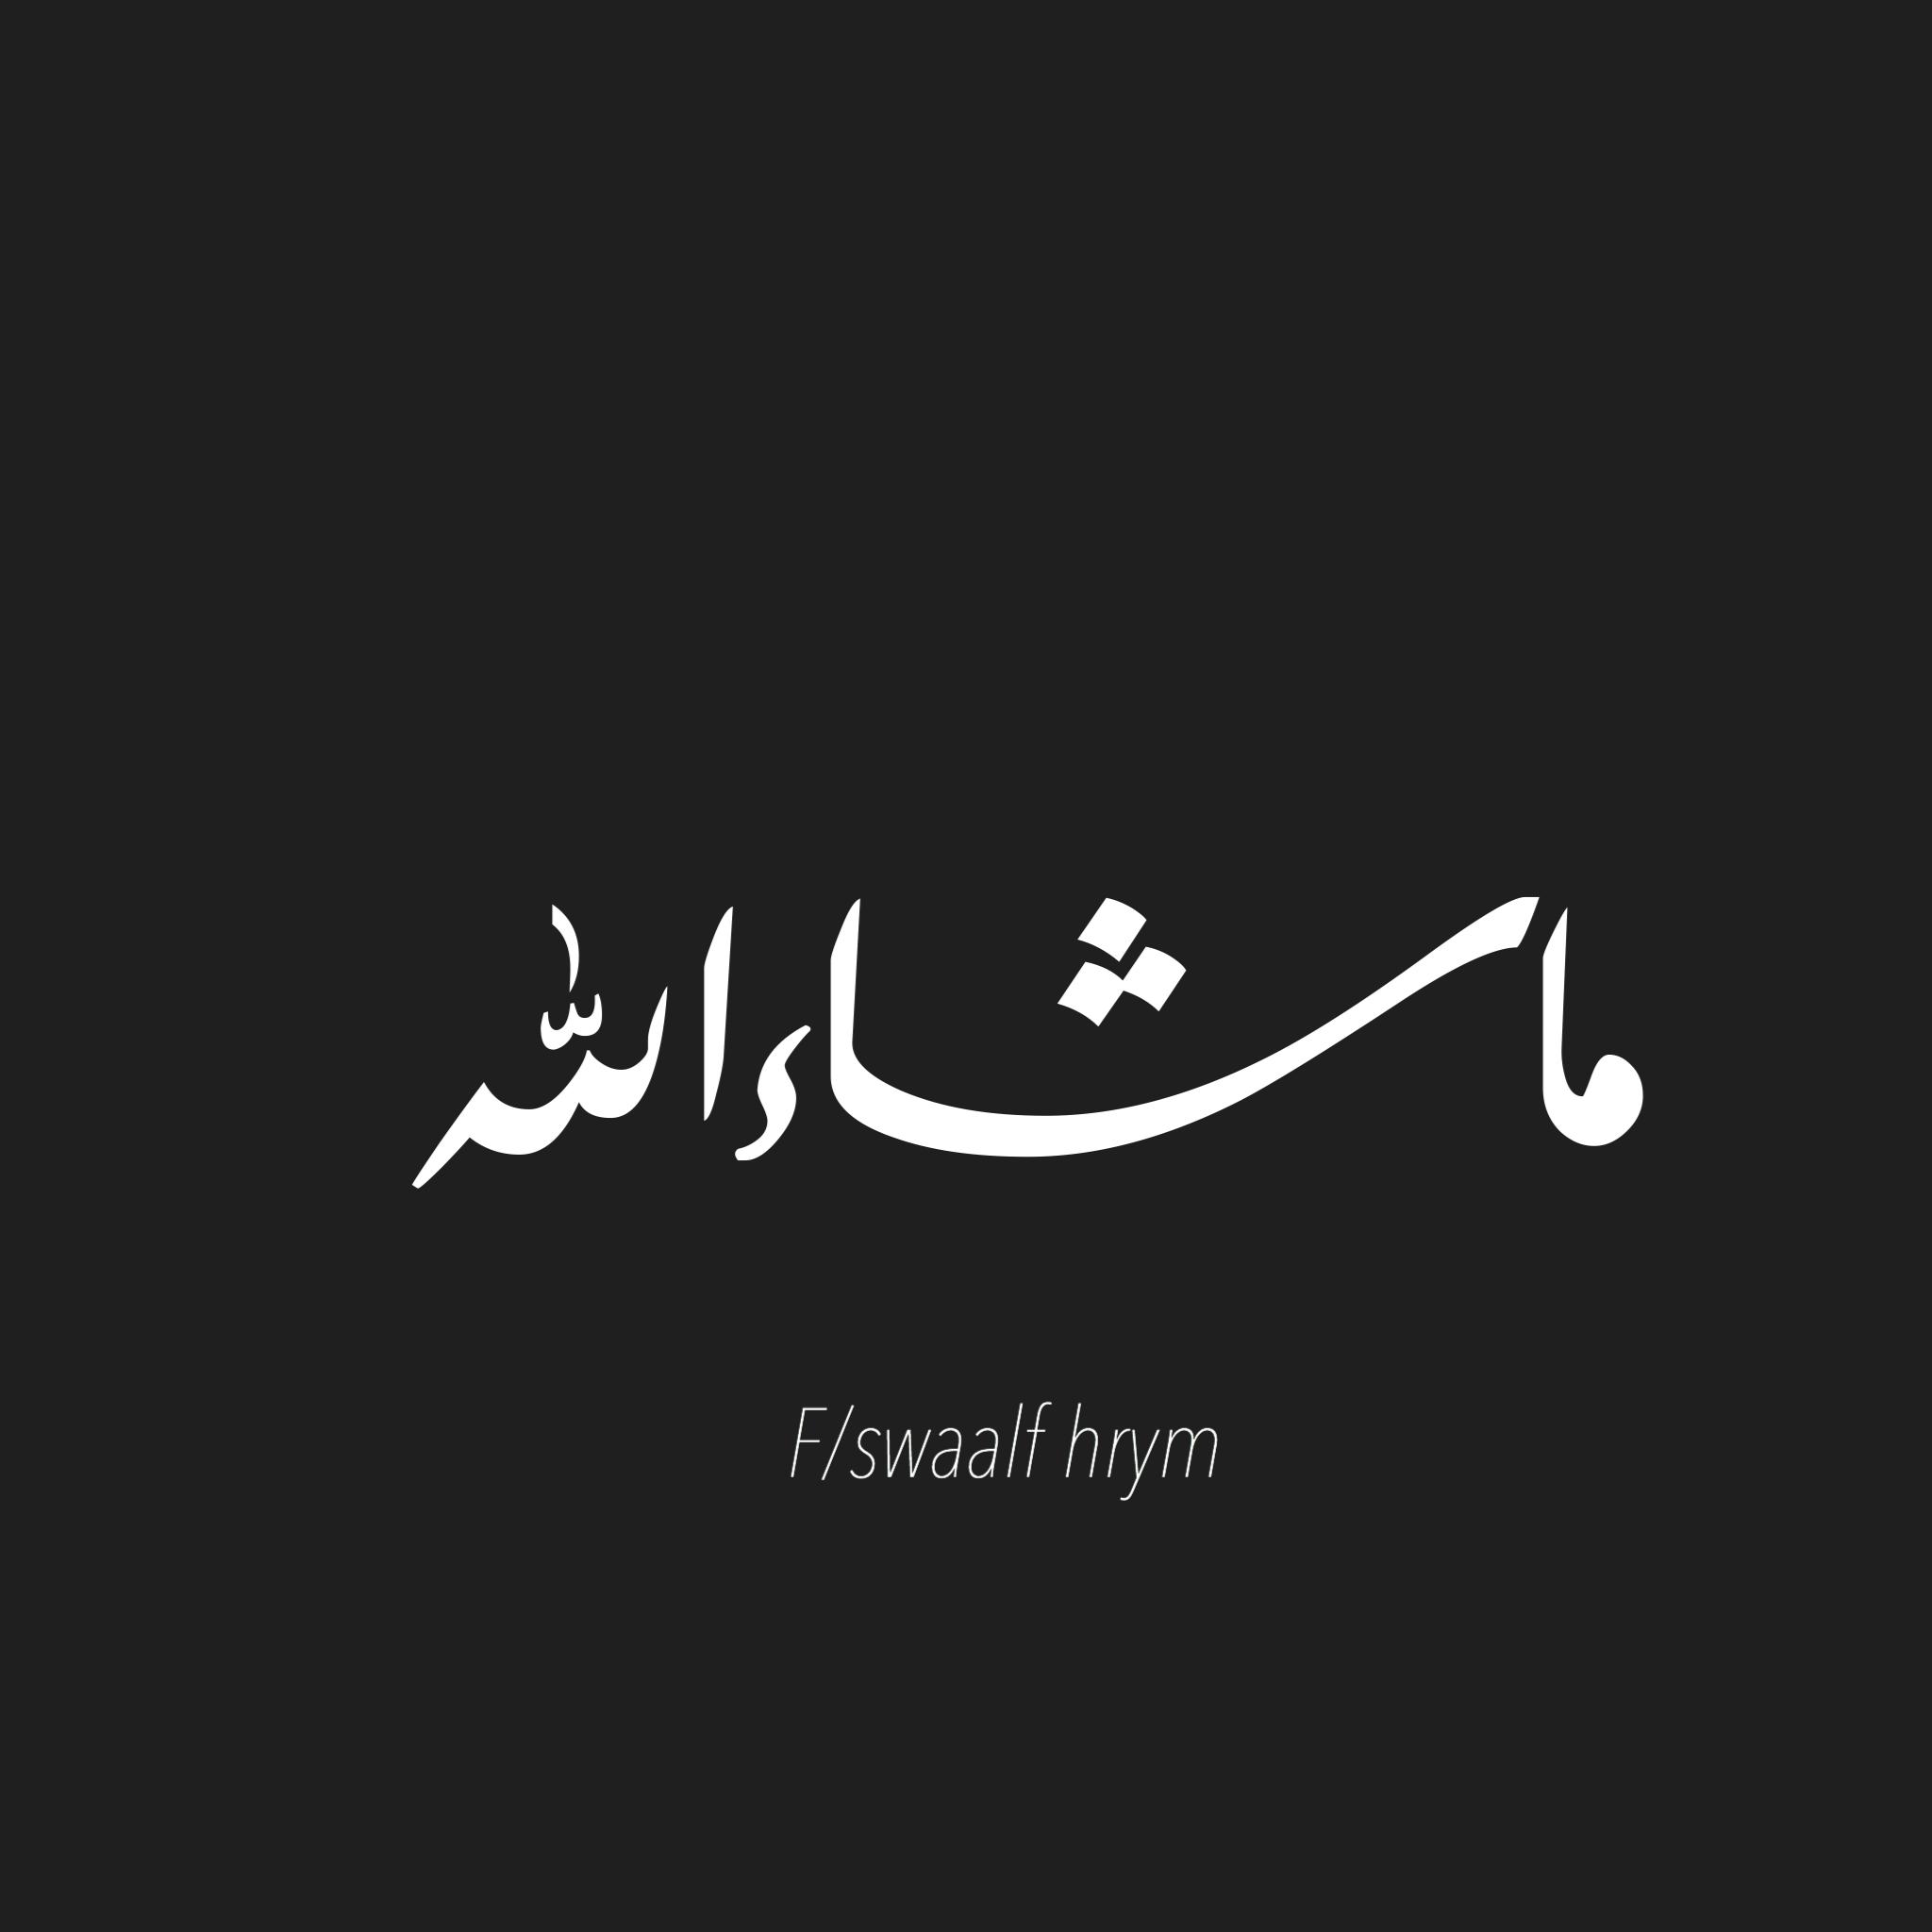 Pin By صور معبرة On خطوط Calligraphy Arabic Calligraphy Arabic